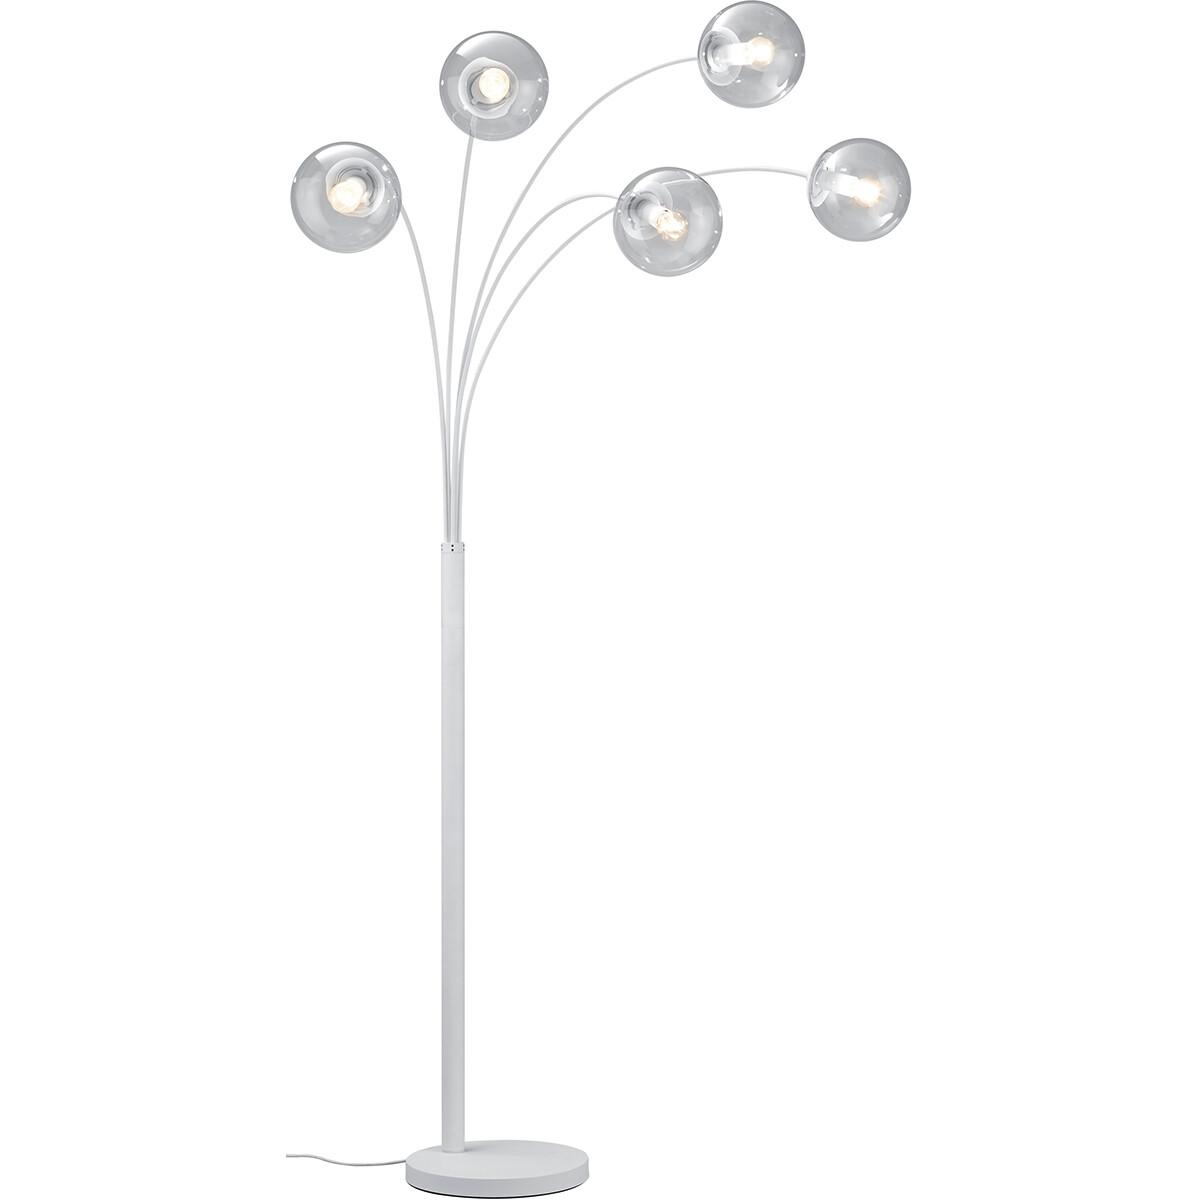 LED Vloerlamp - Trion Balina - E14 Fitting - Rond - Mat Wit - Aluminium